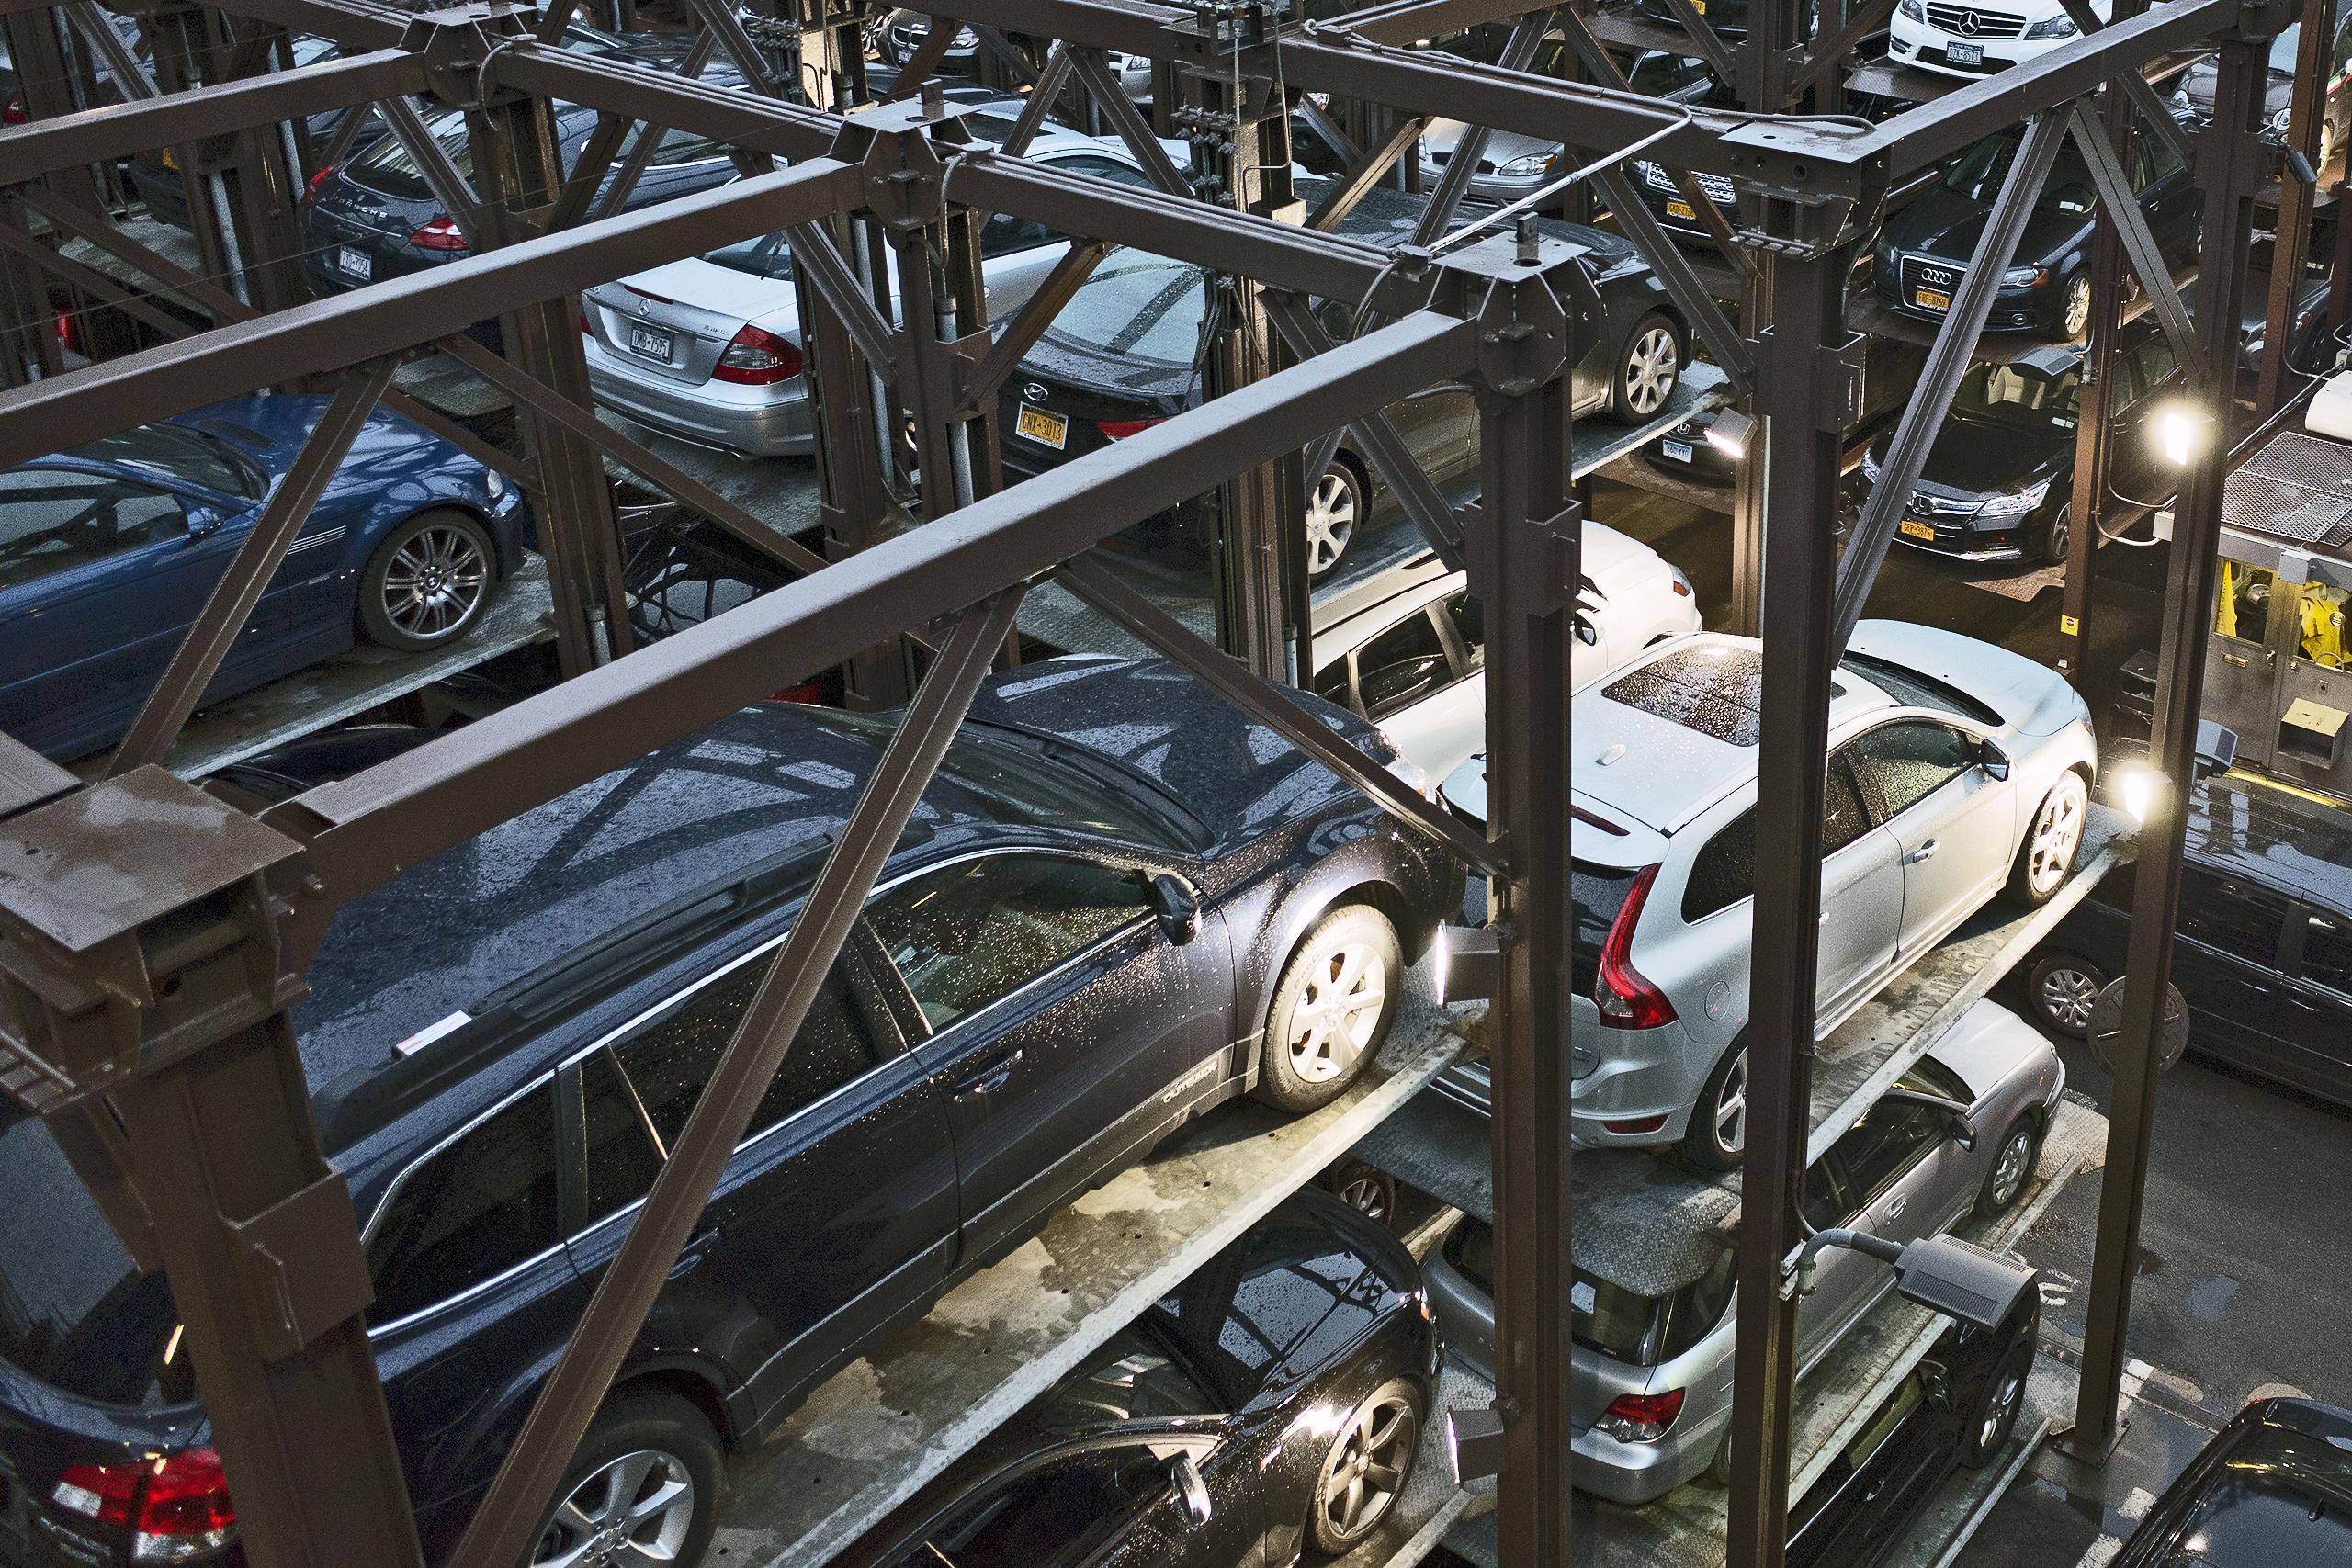 Car storage/parking; New York City, New York | Photo: Matthias Ries